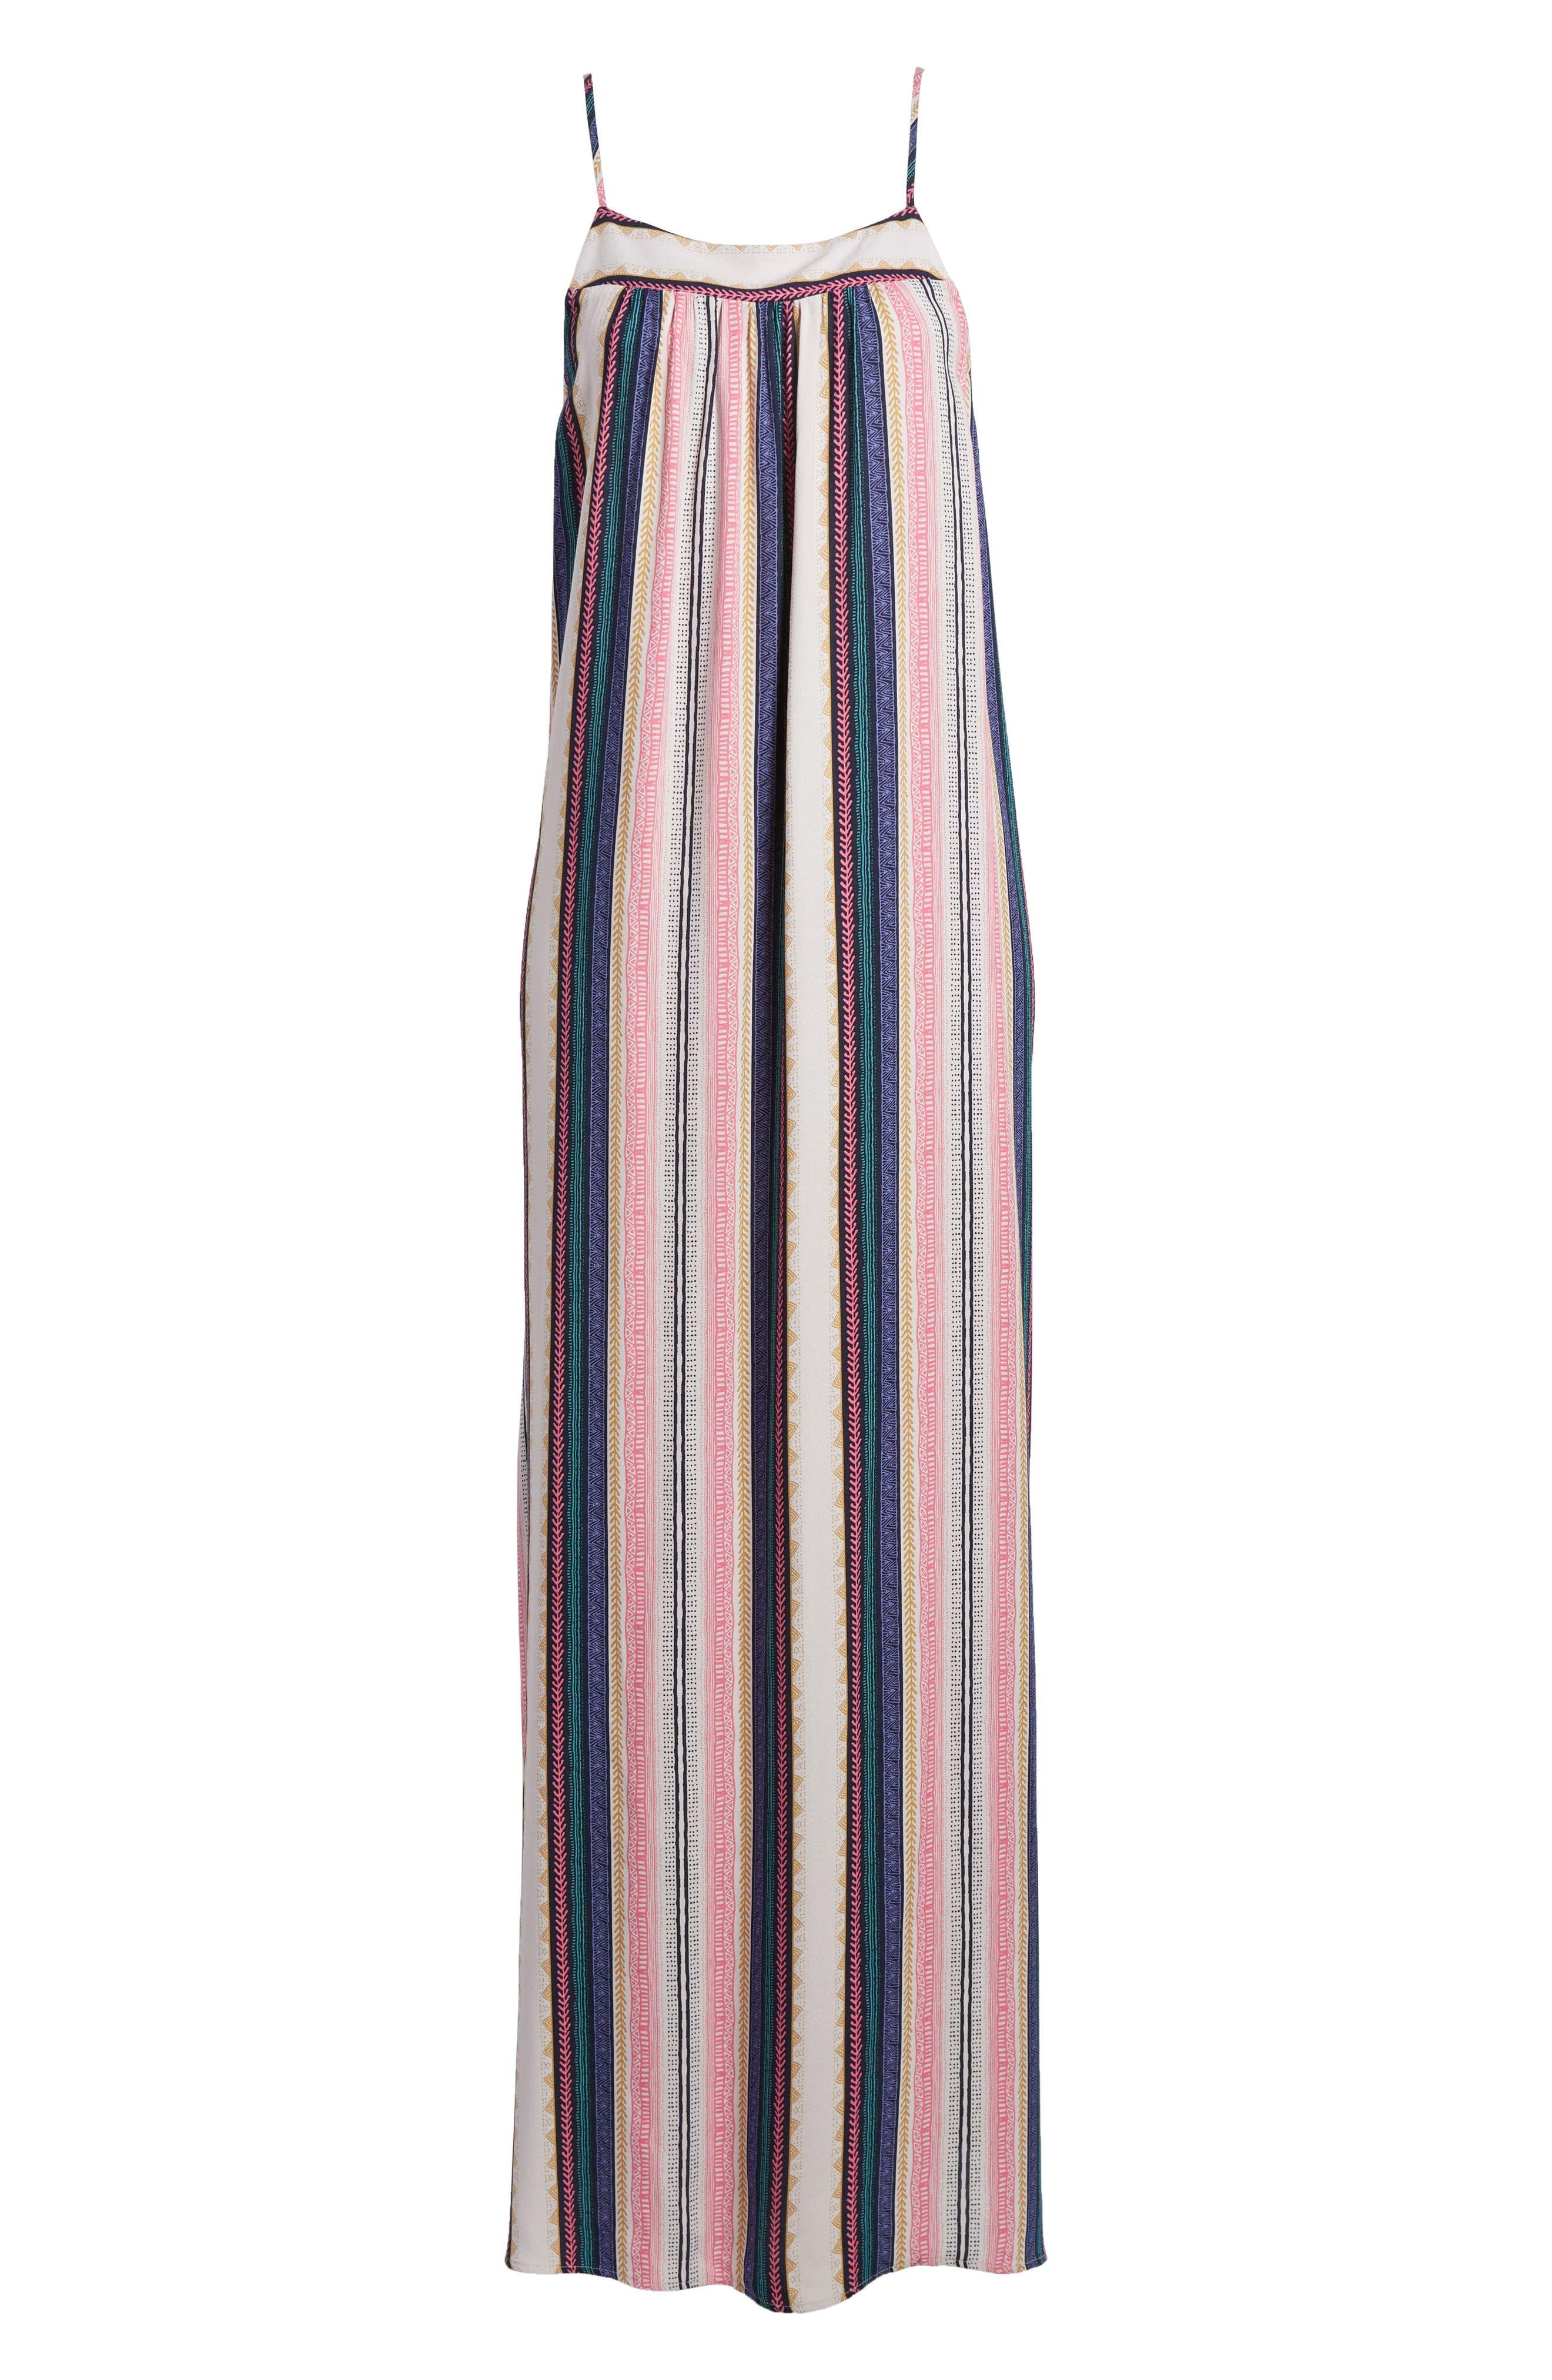 ONE CLOTHING,                             Stripe Maxi Dress,                             Alternate thumbnail 6, color,                             650